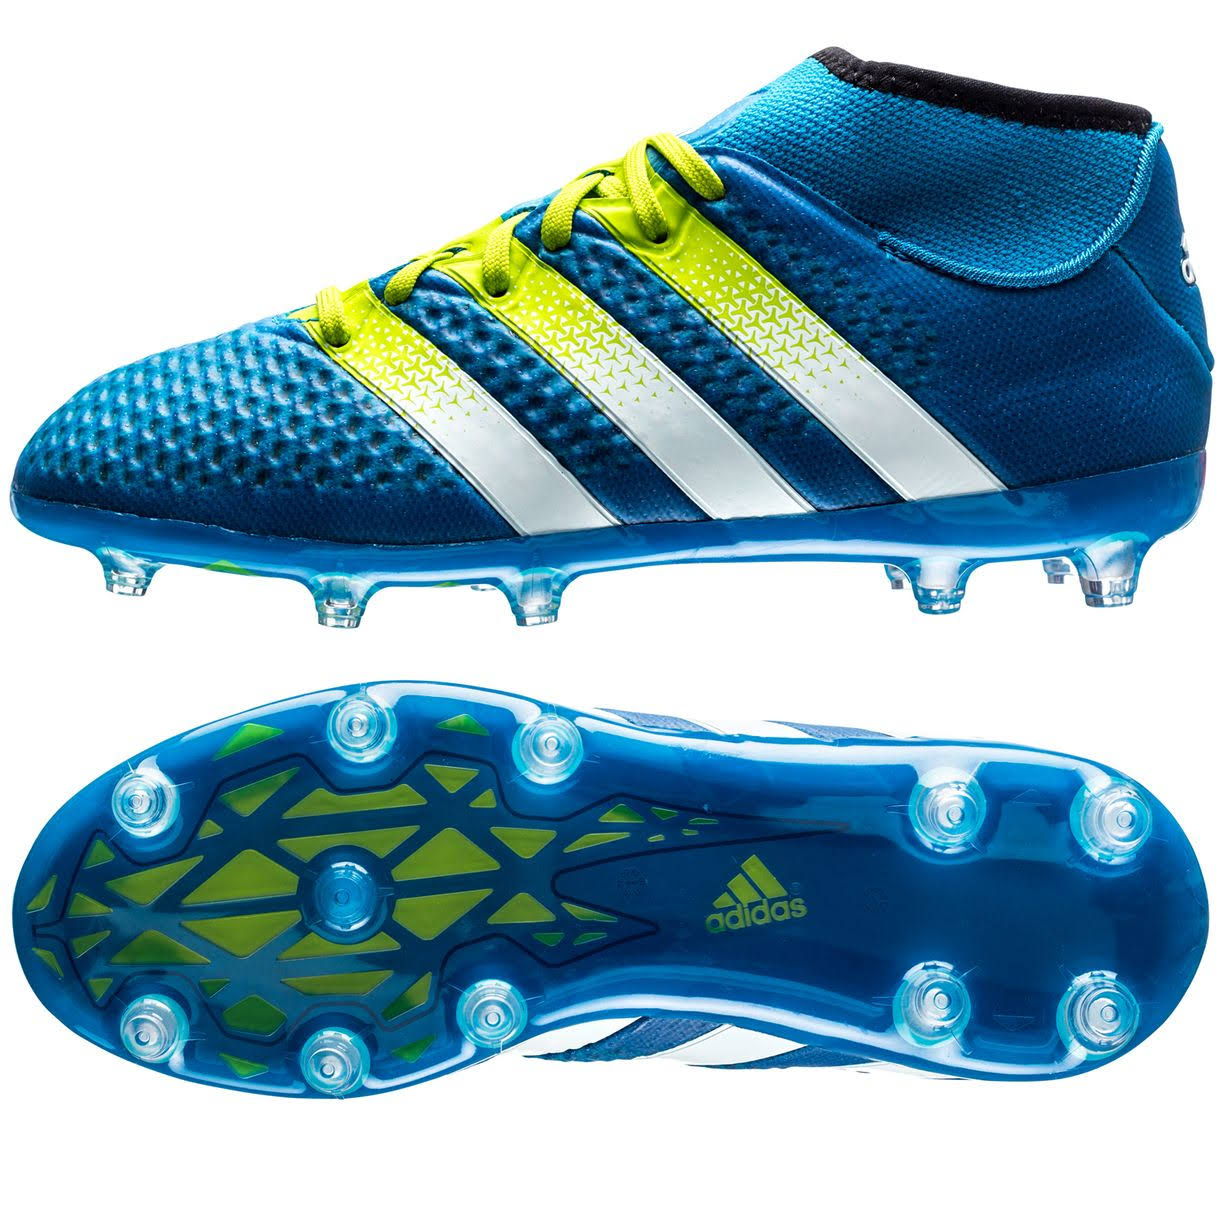 Ace Fg Adidas 1 Aq5152 Ag 7 16 Usa Primers gqxwXCx5a